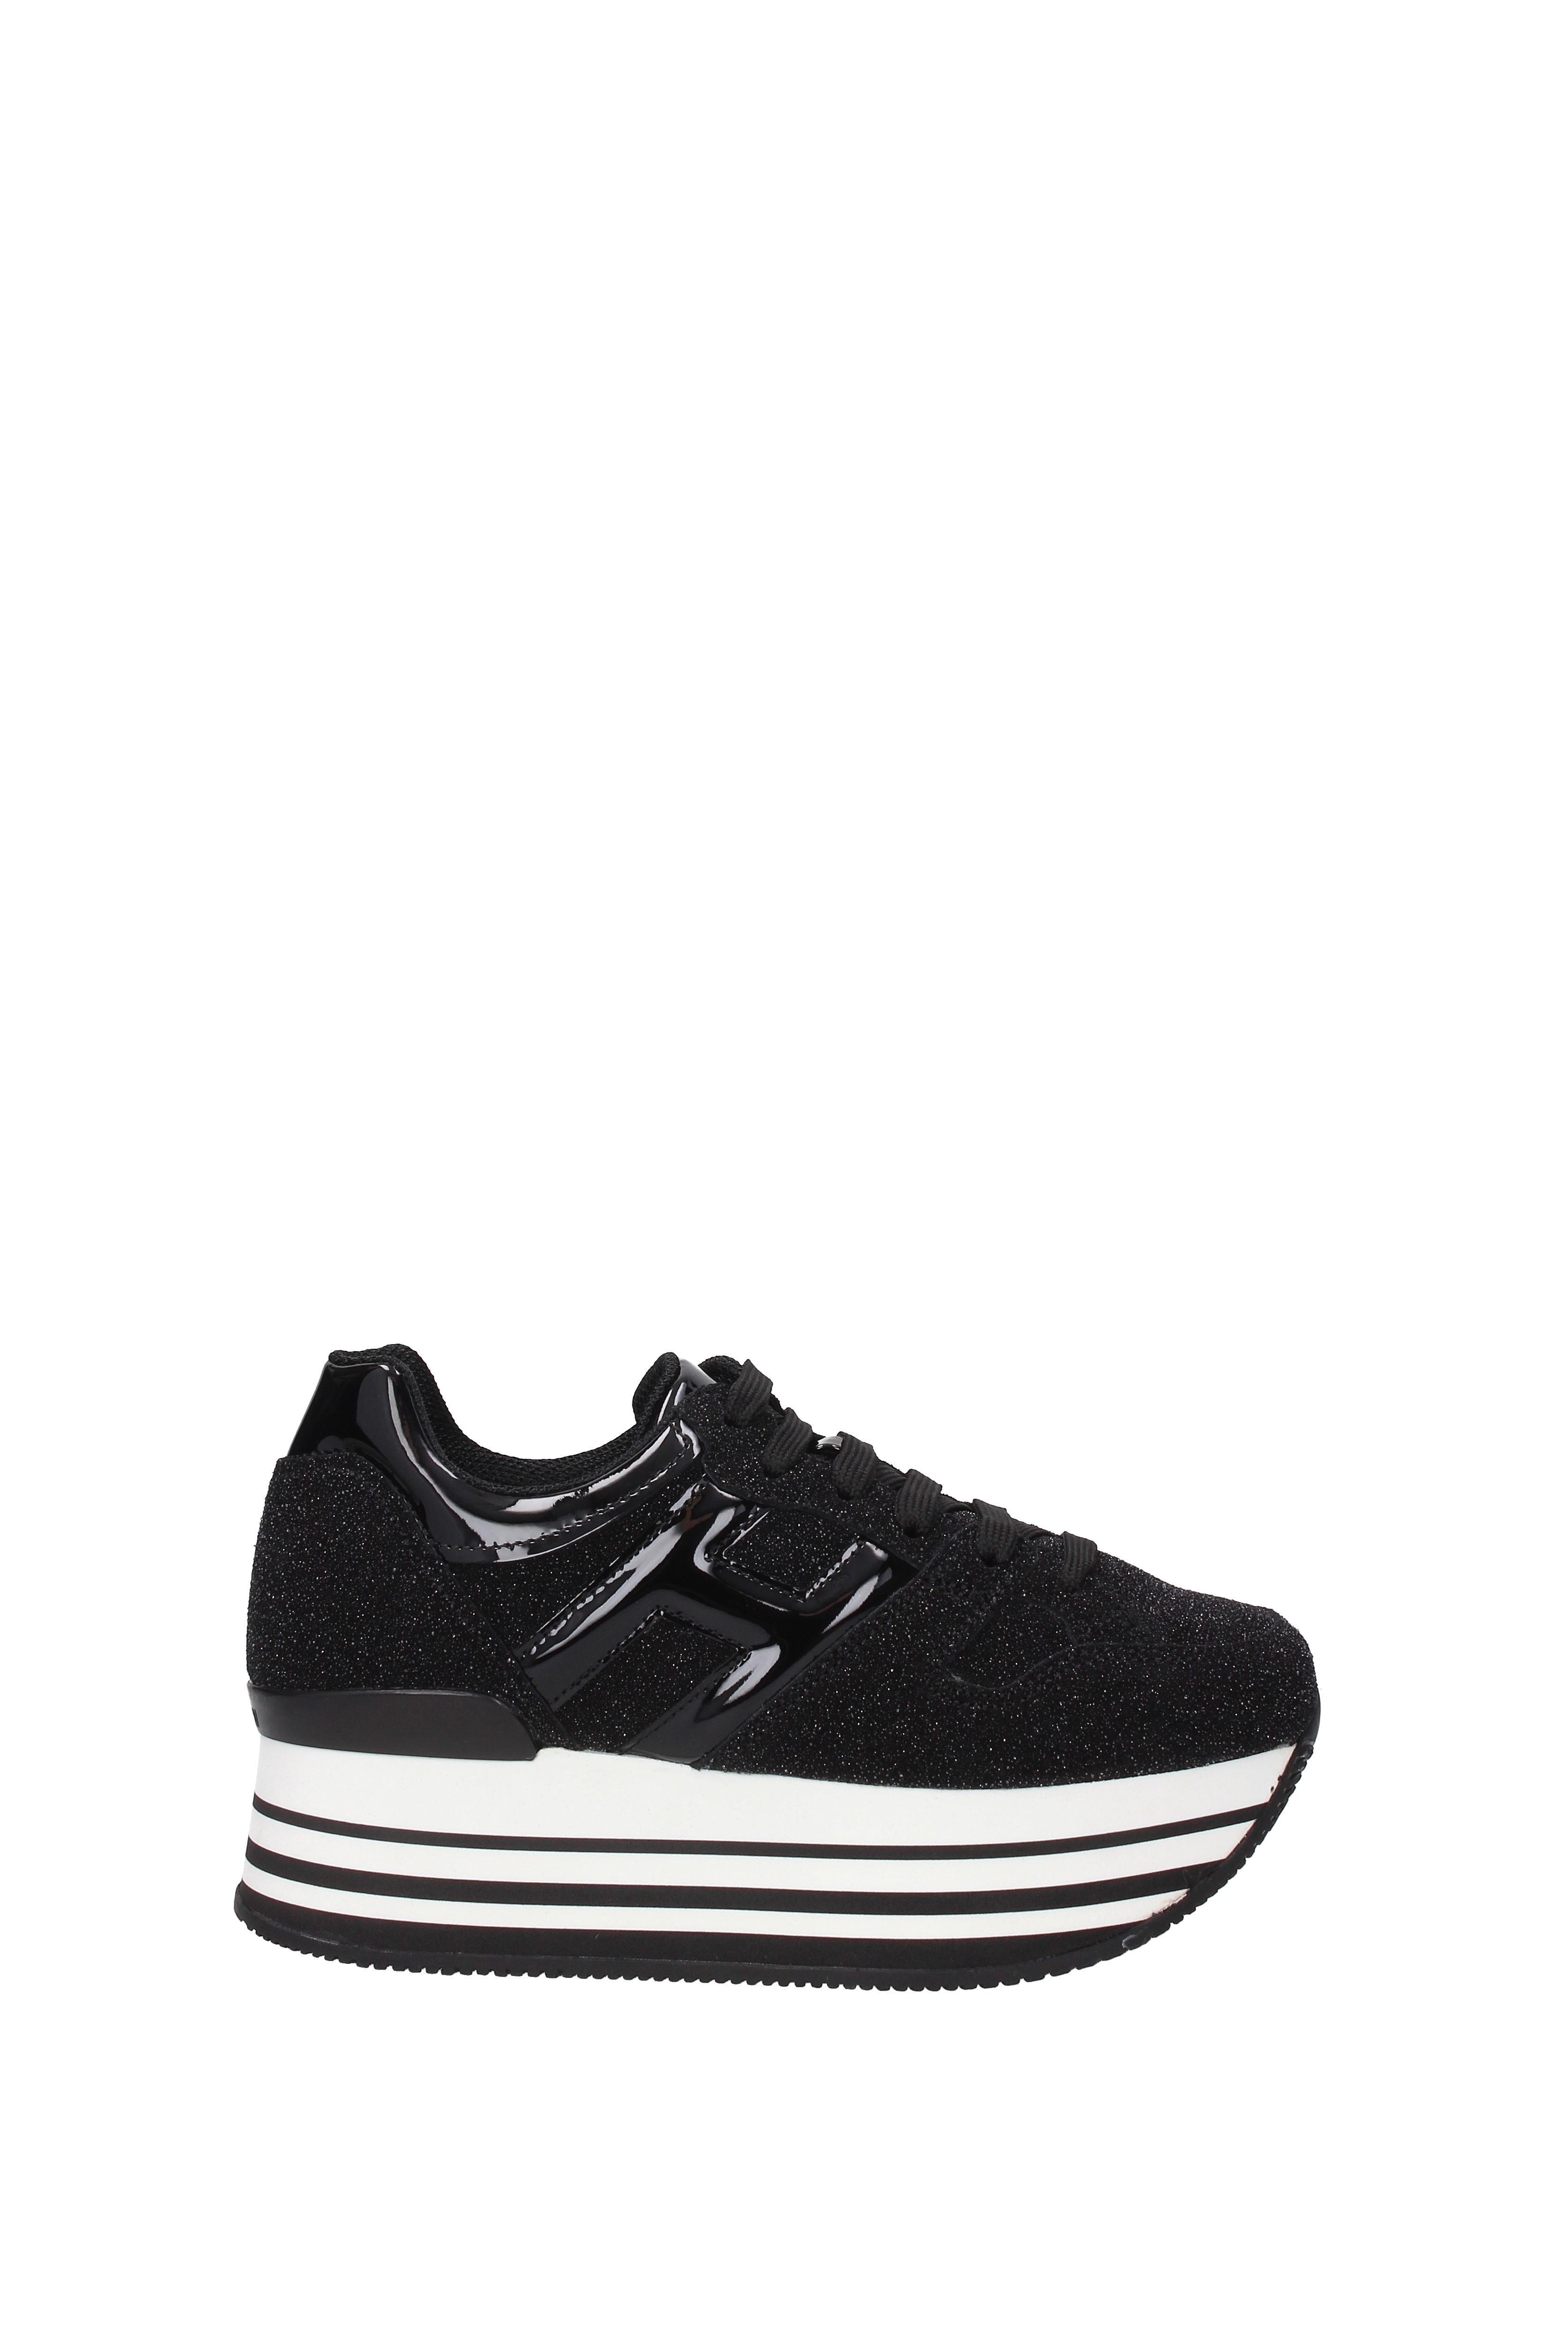 premium selection 247b9 5043b Alta qualit Sneakers Hogan Donna Camoscio HXW2830T548667 vendita -  mainstreetblytheville.org